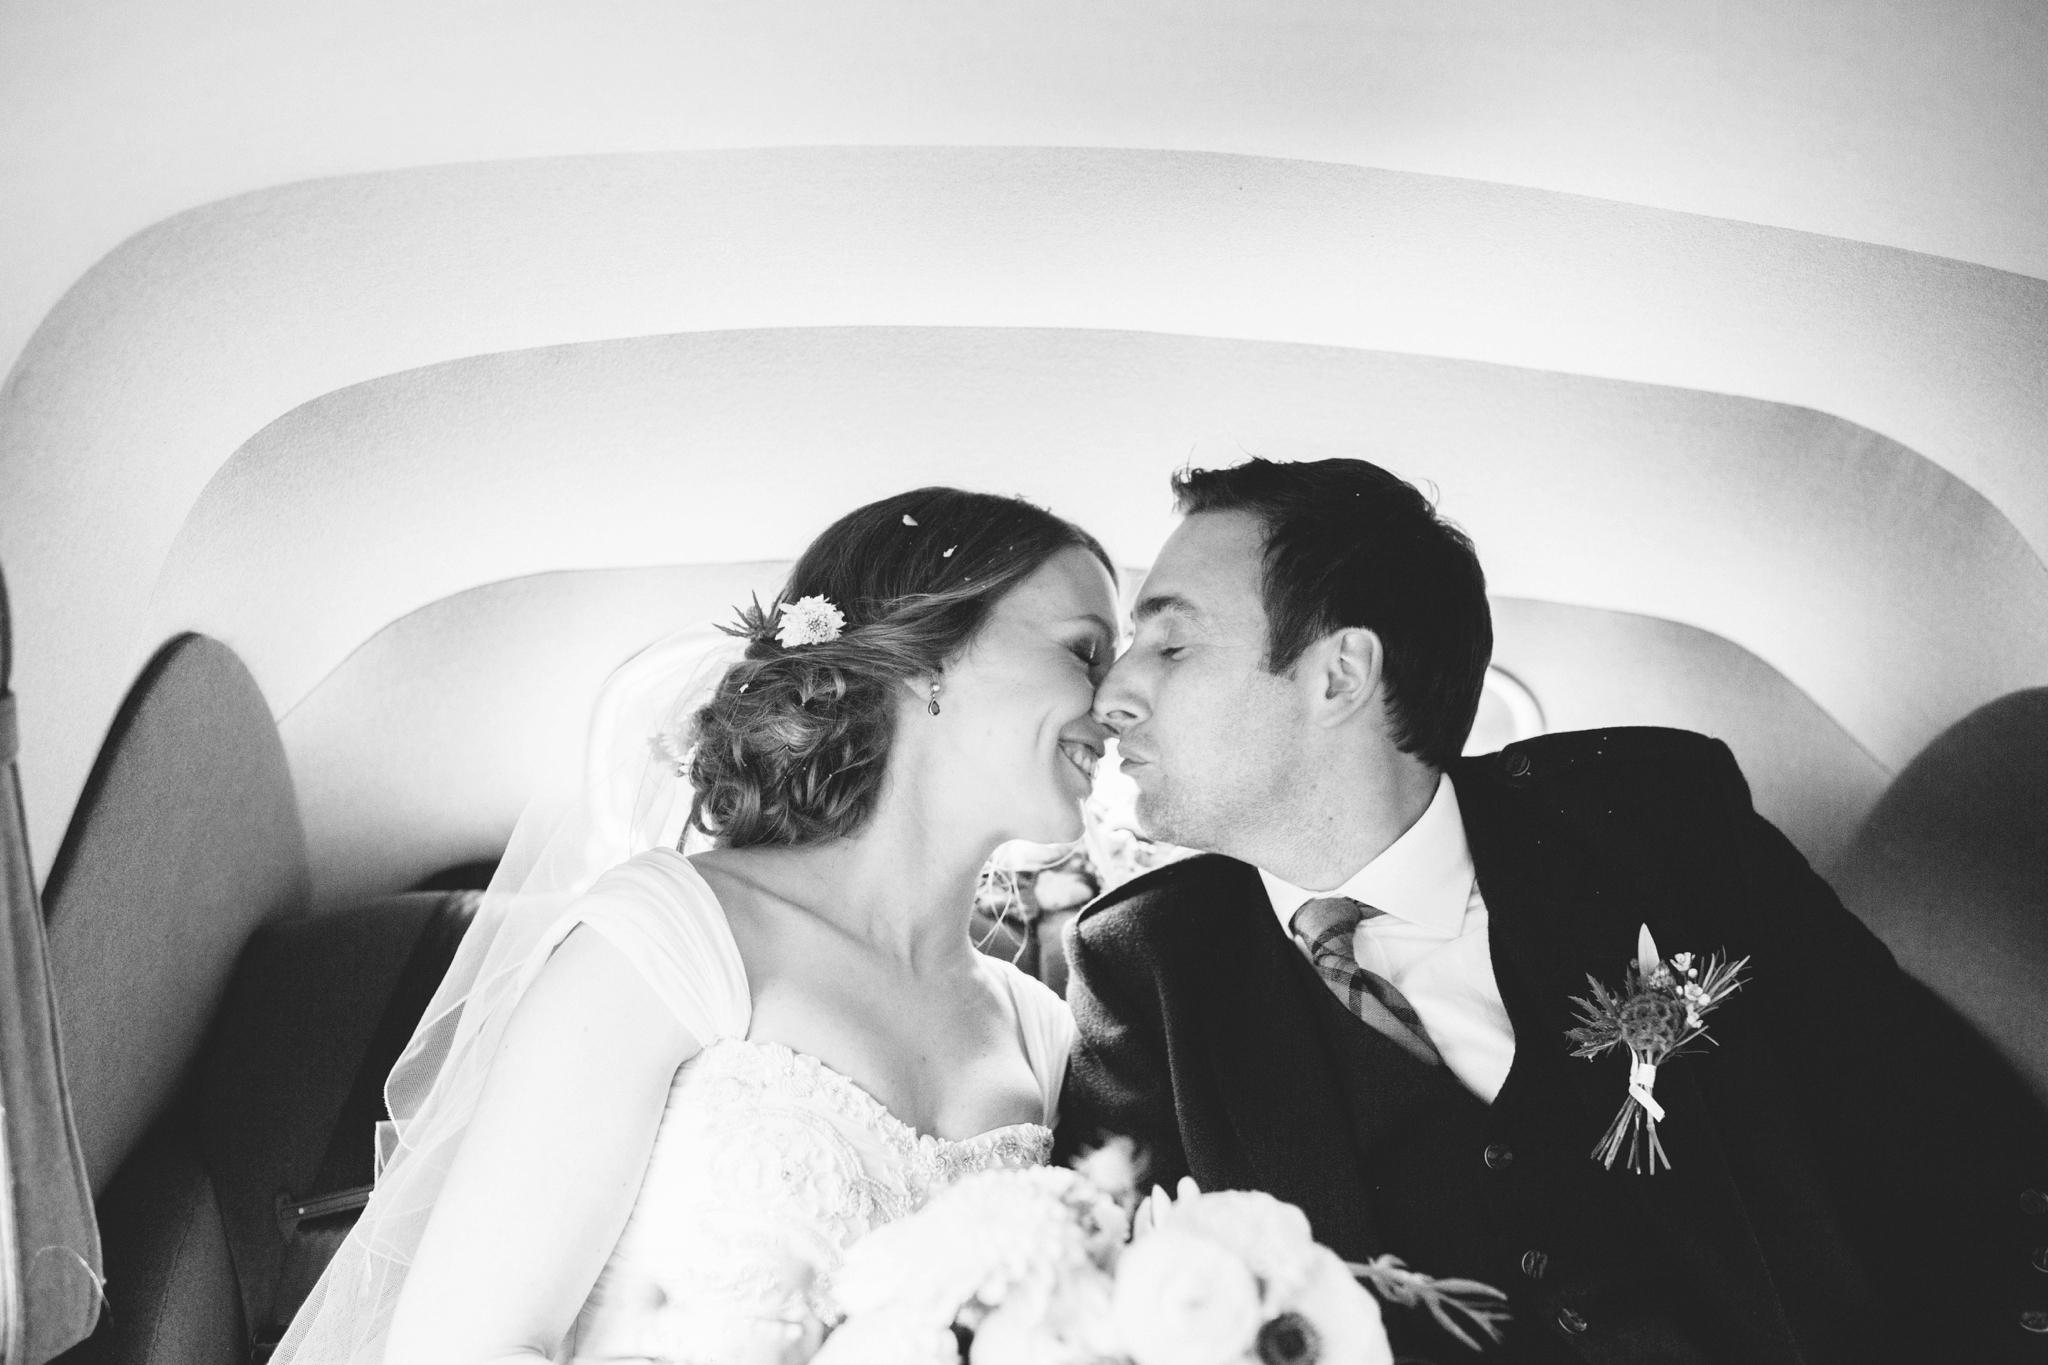 Suzanne_li_photography_kirknewton_wedding_0022.jpg